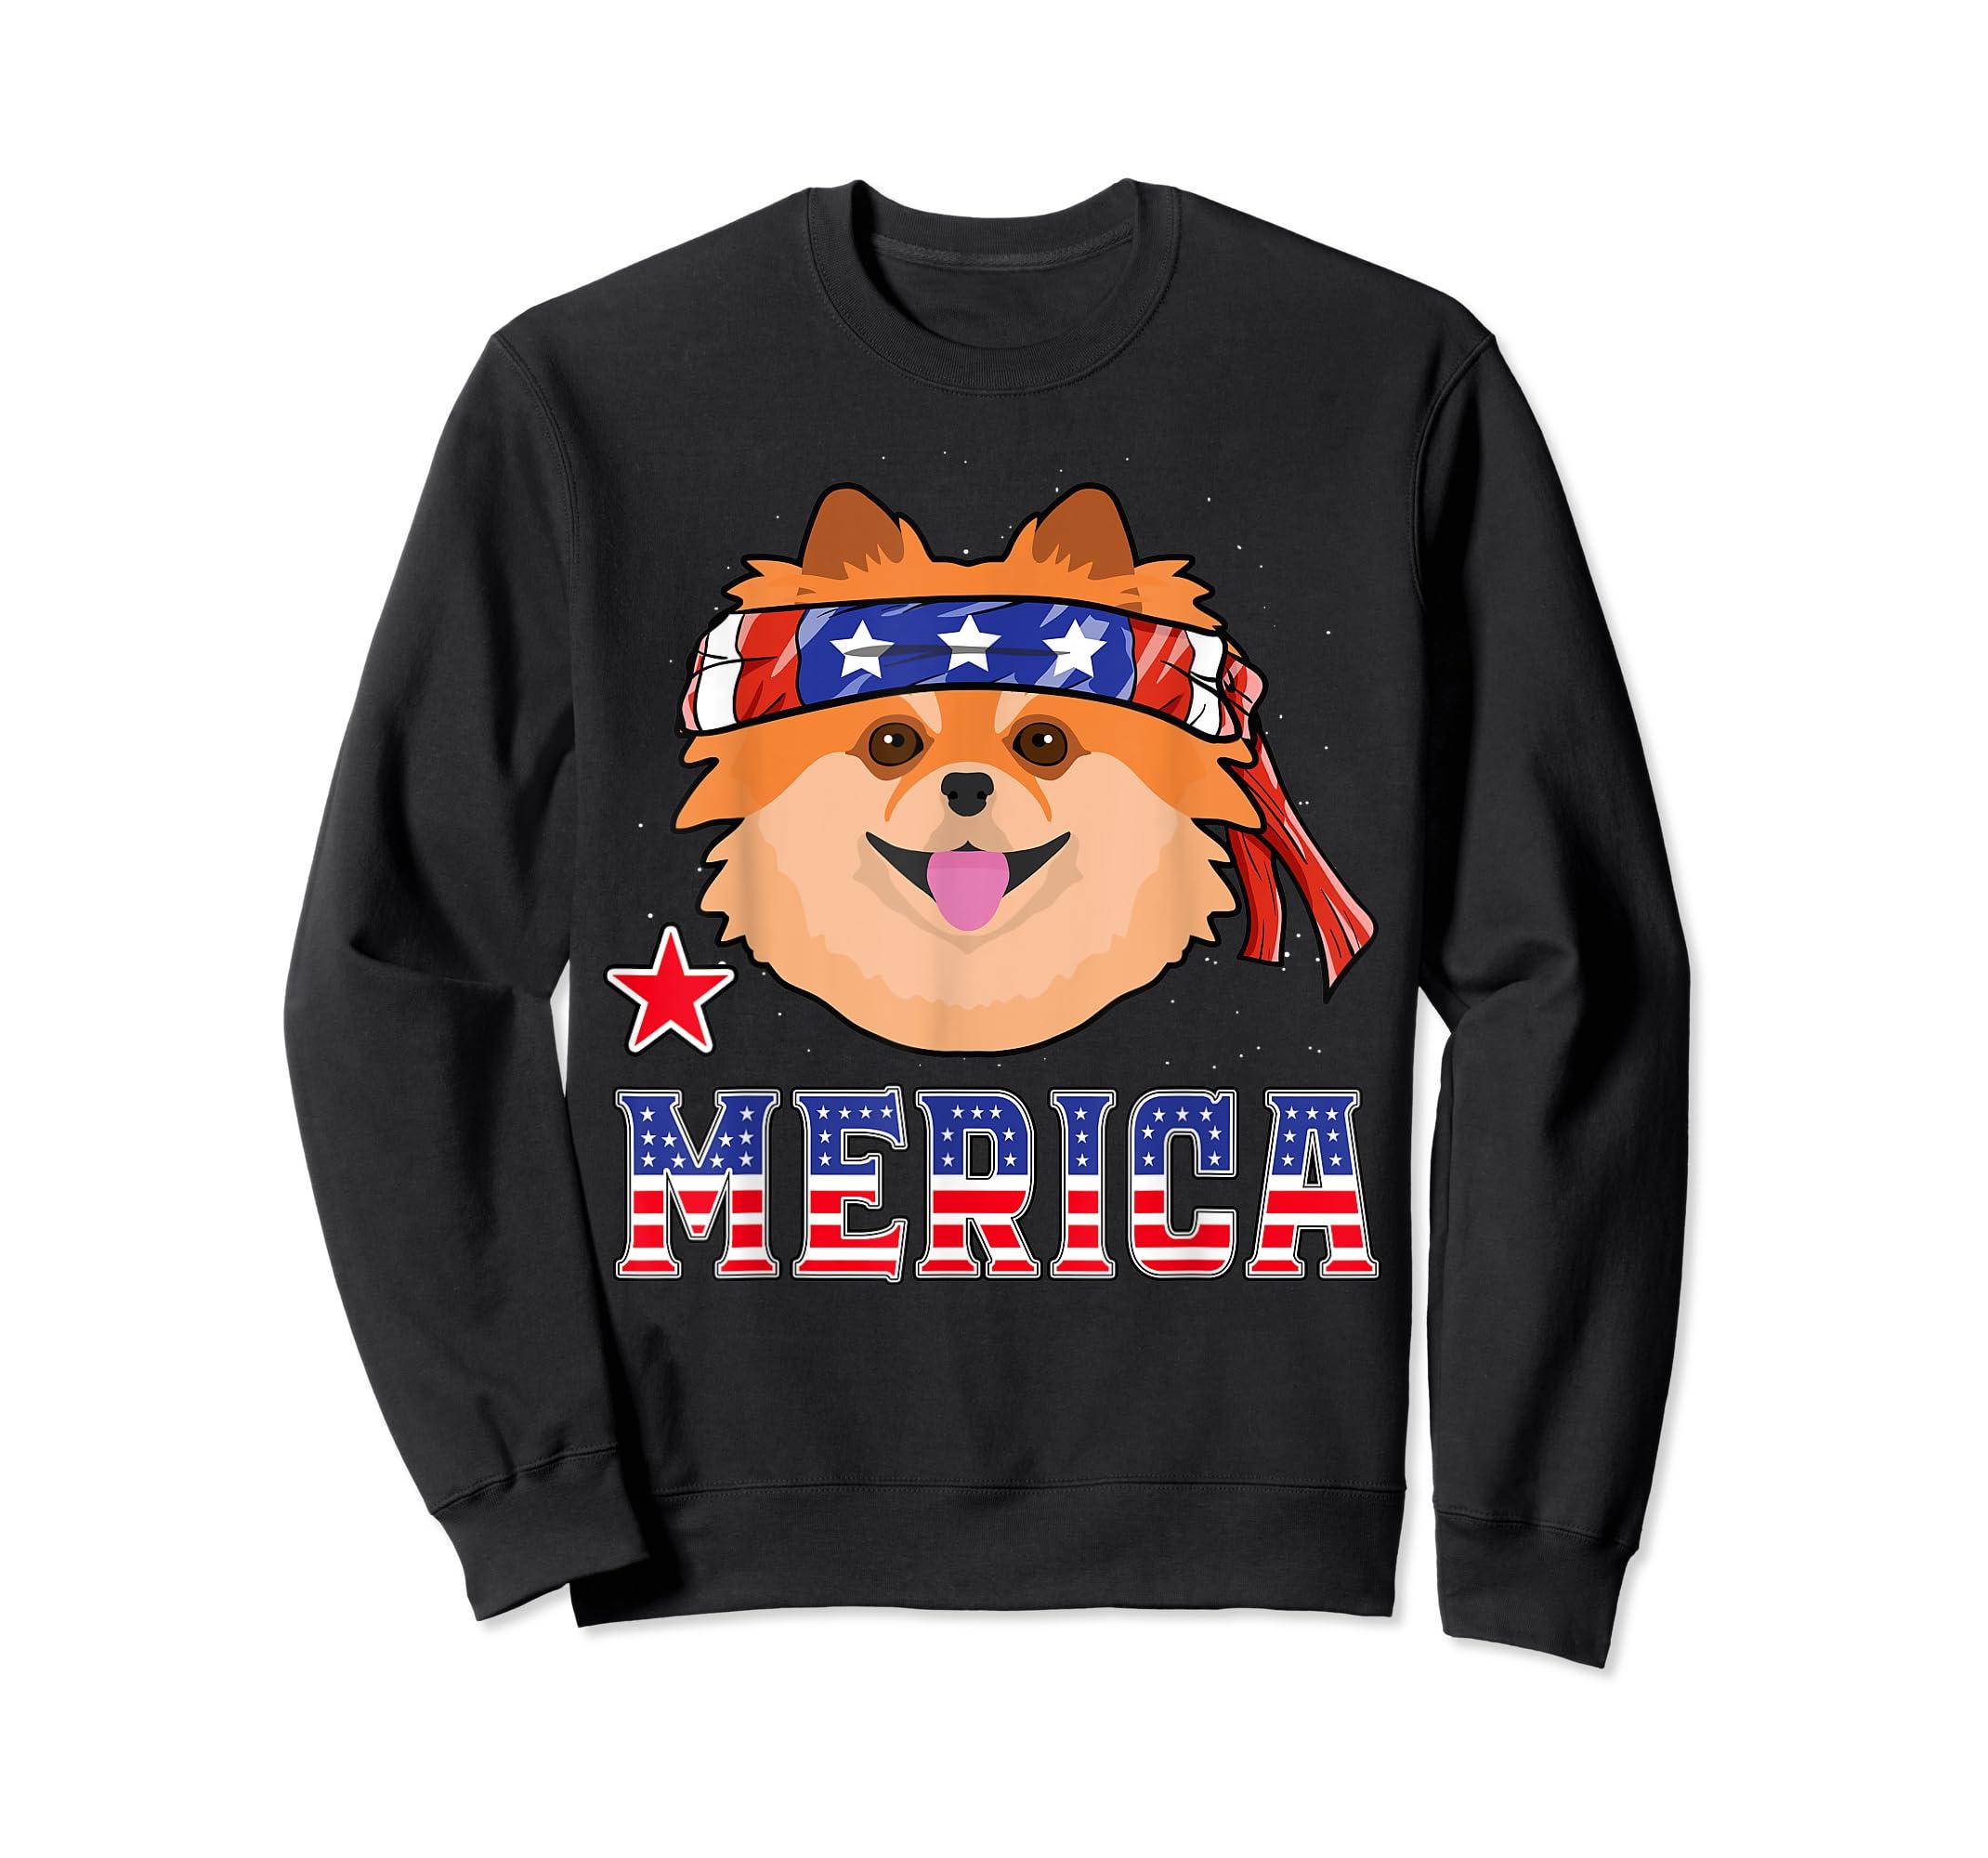 Pomeranian Dog Patriotic American 4th Of July Gift Dogs T-Shirt-Sweatshirt-Black